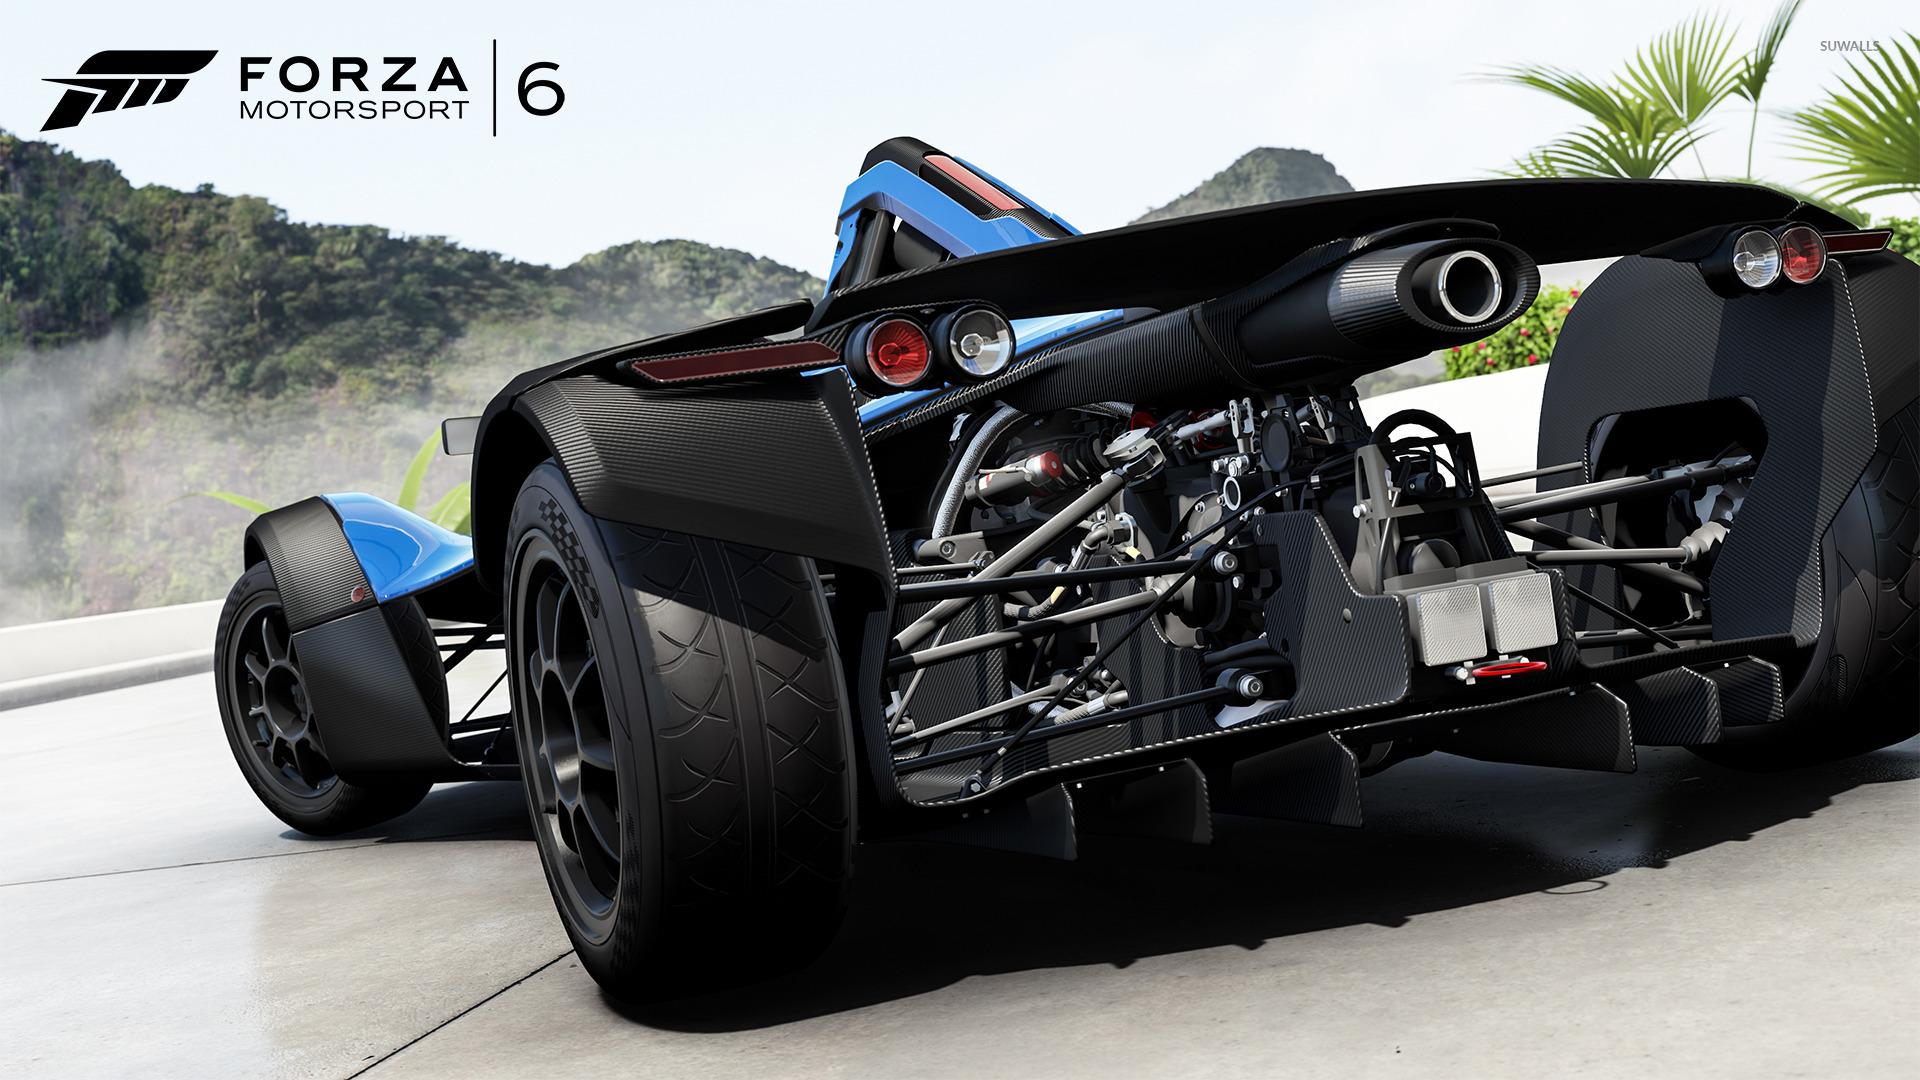 BAC Mono   Forza Motorsport 6 wallpaper   Game wallpapers   49034 1366x768